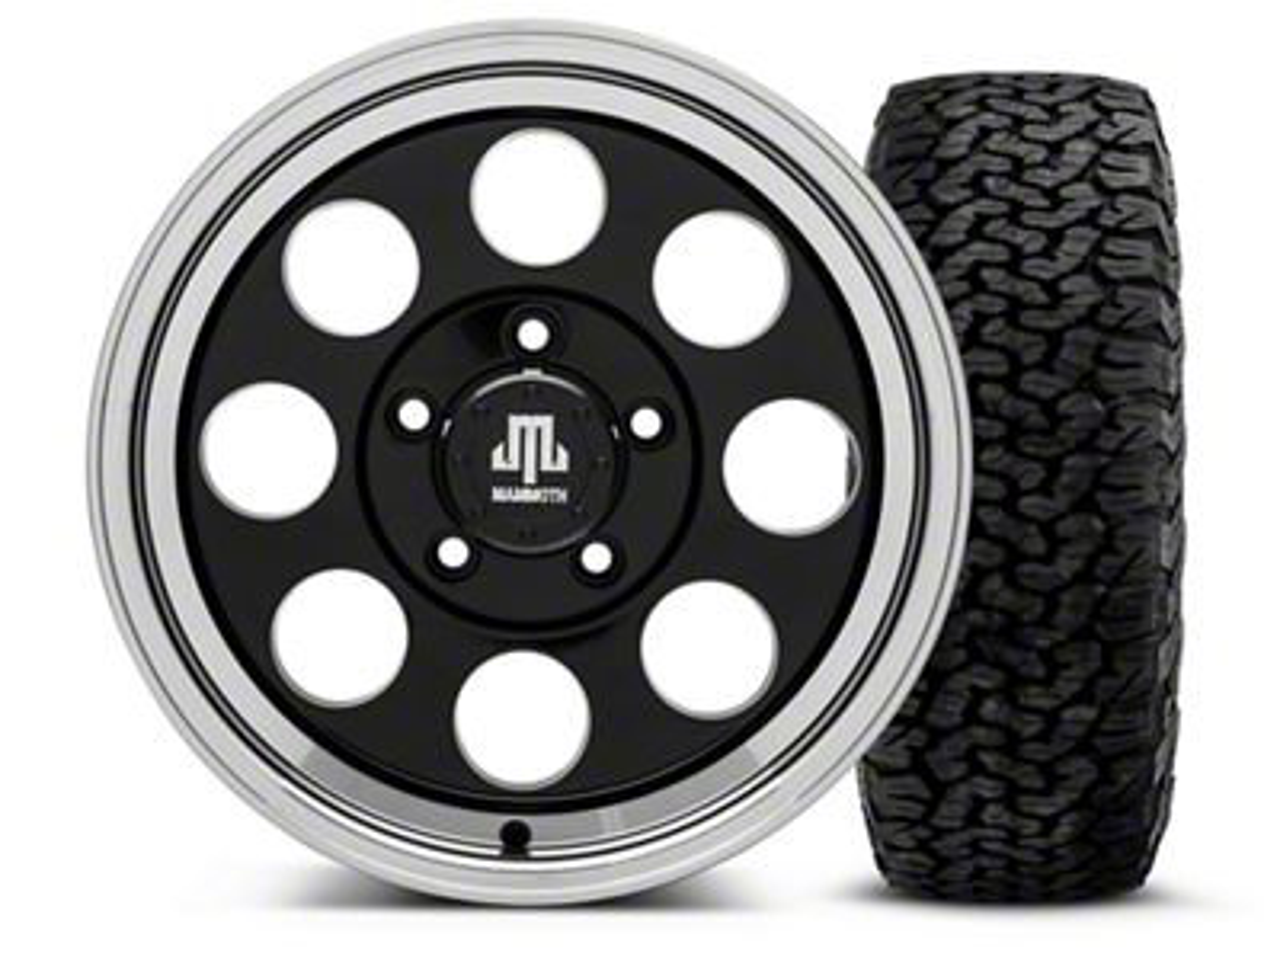 Mammoth 8 Black - 16x8 Wheel - and BF Goodrich All Terrain TA KO2 Tire - 305/70R16 (07-18 Jeep Wrangler JK)